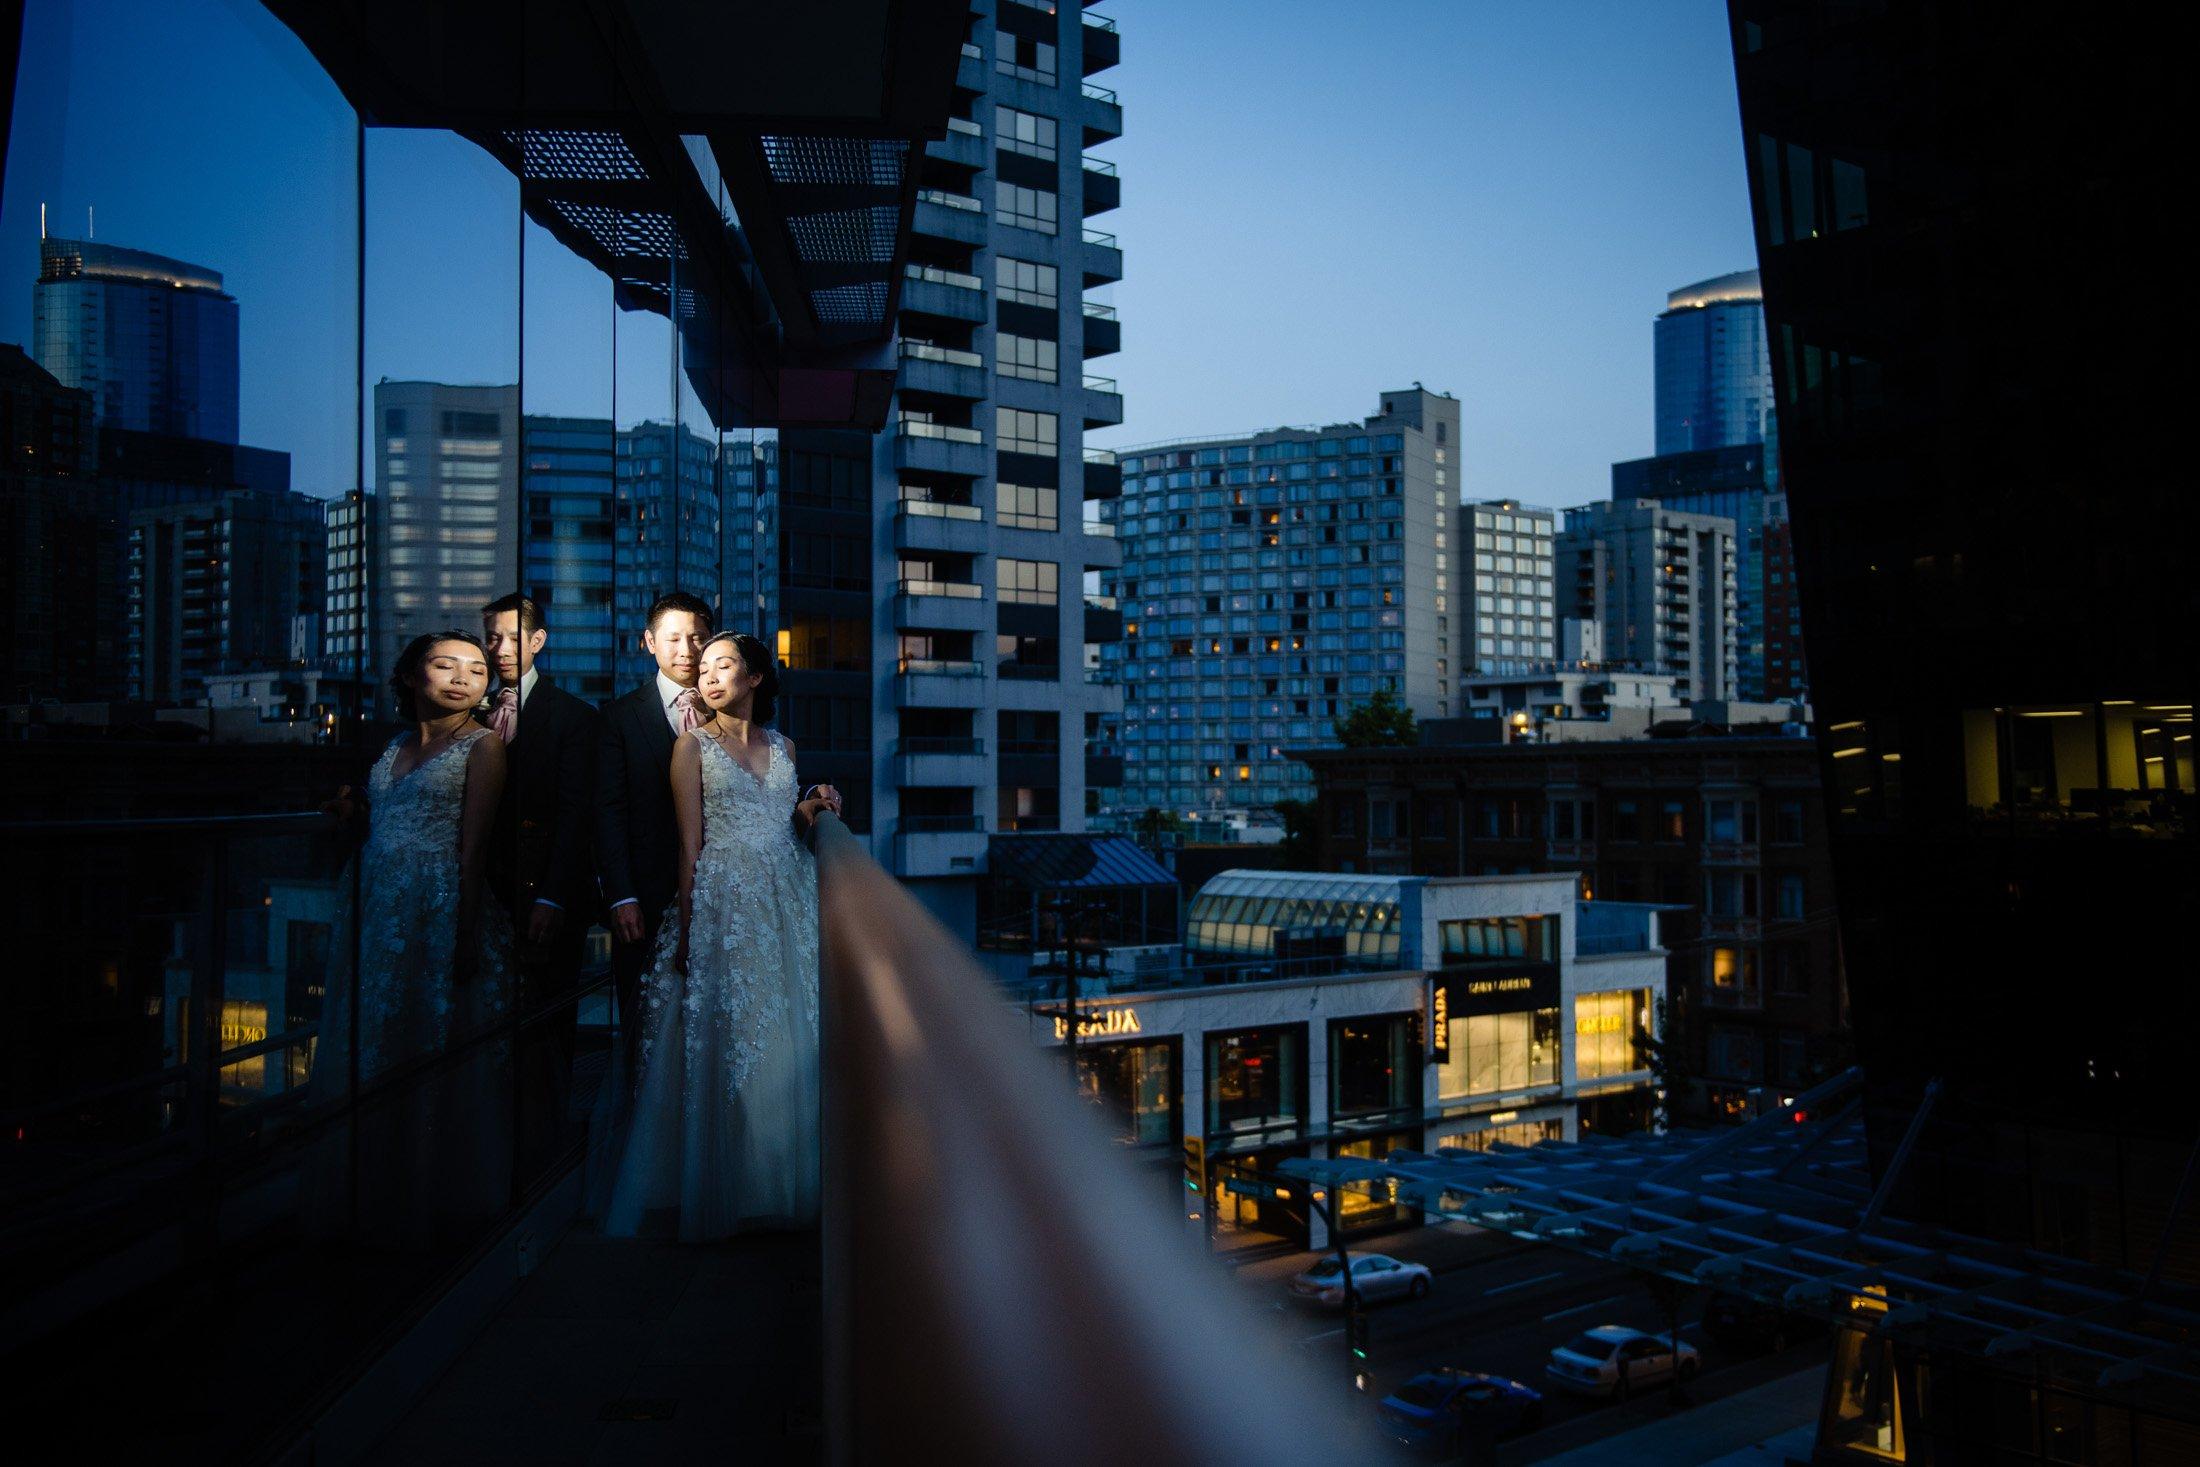 022 - night photos downtown vancouver shangri-la